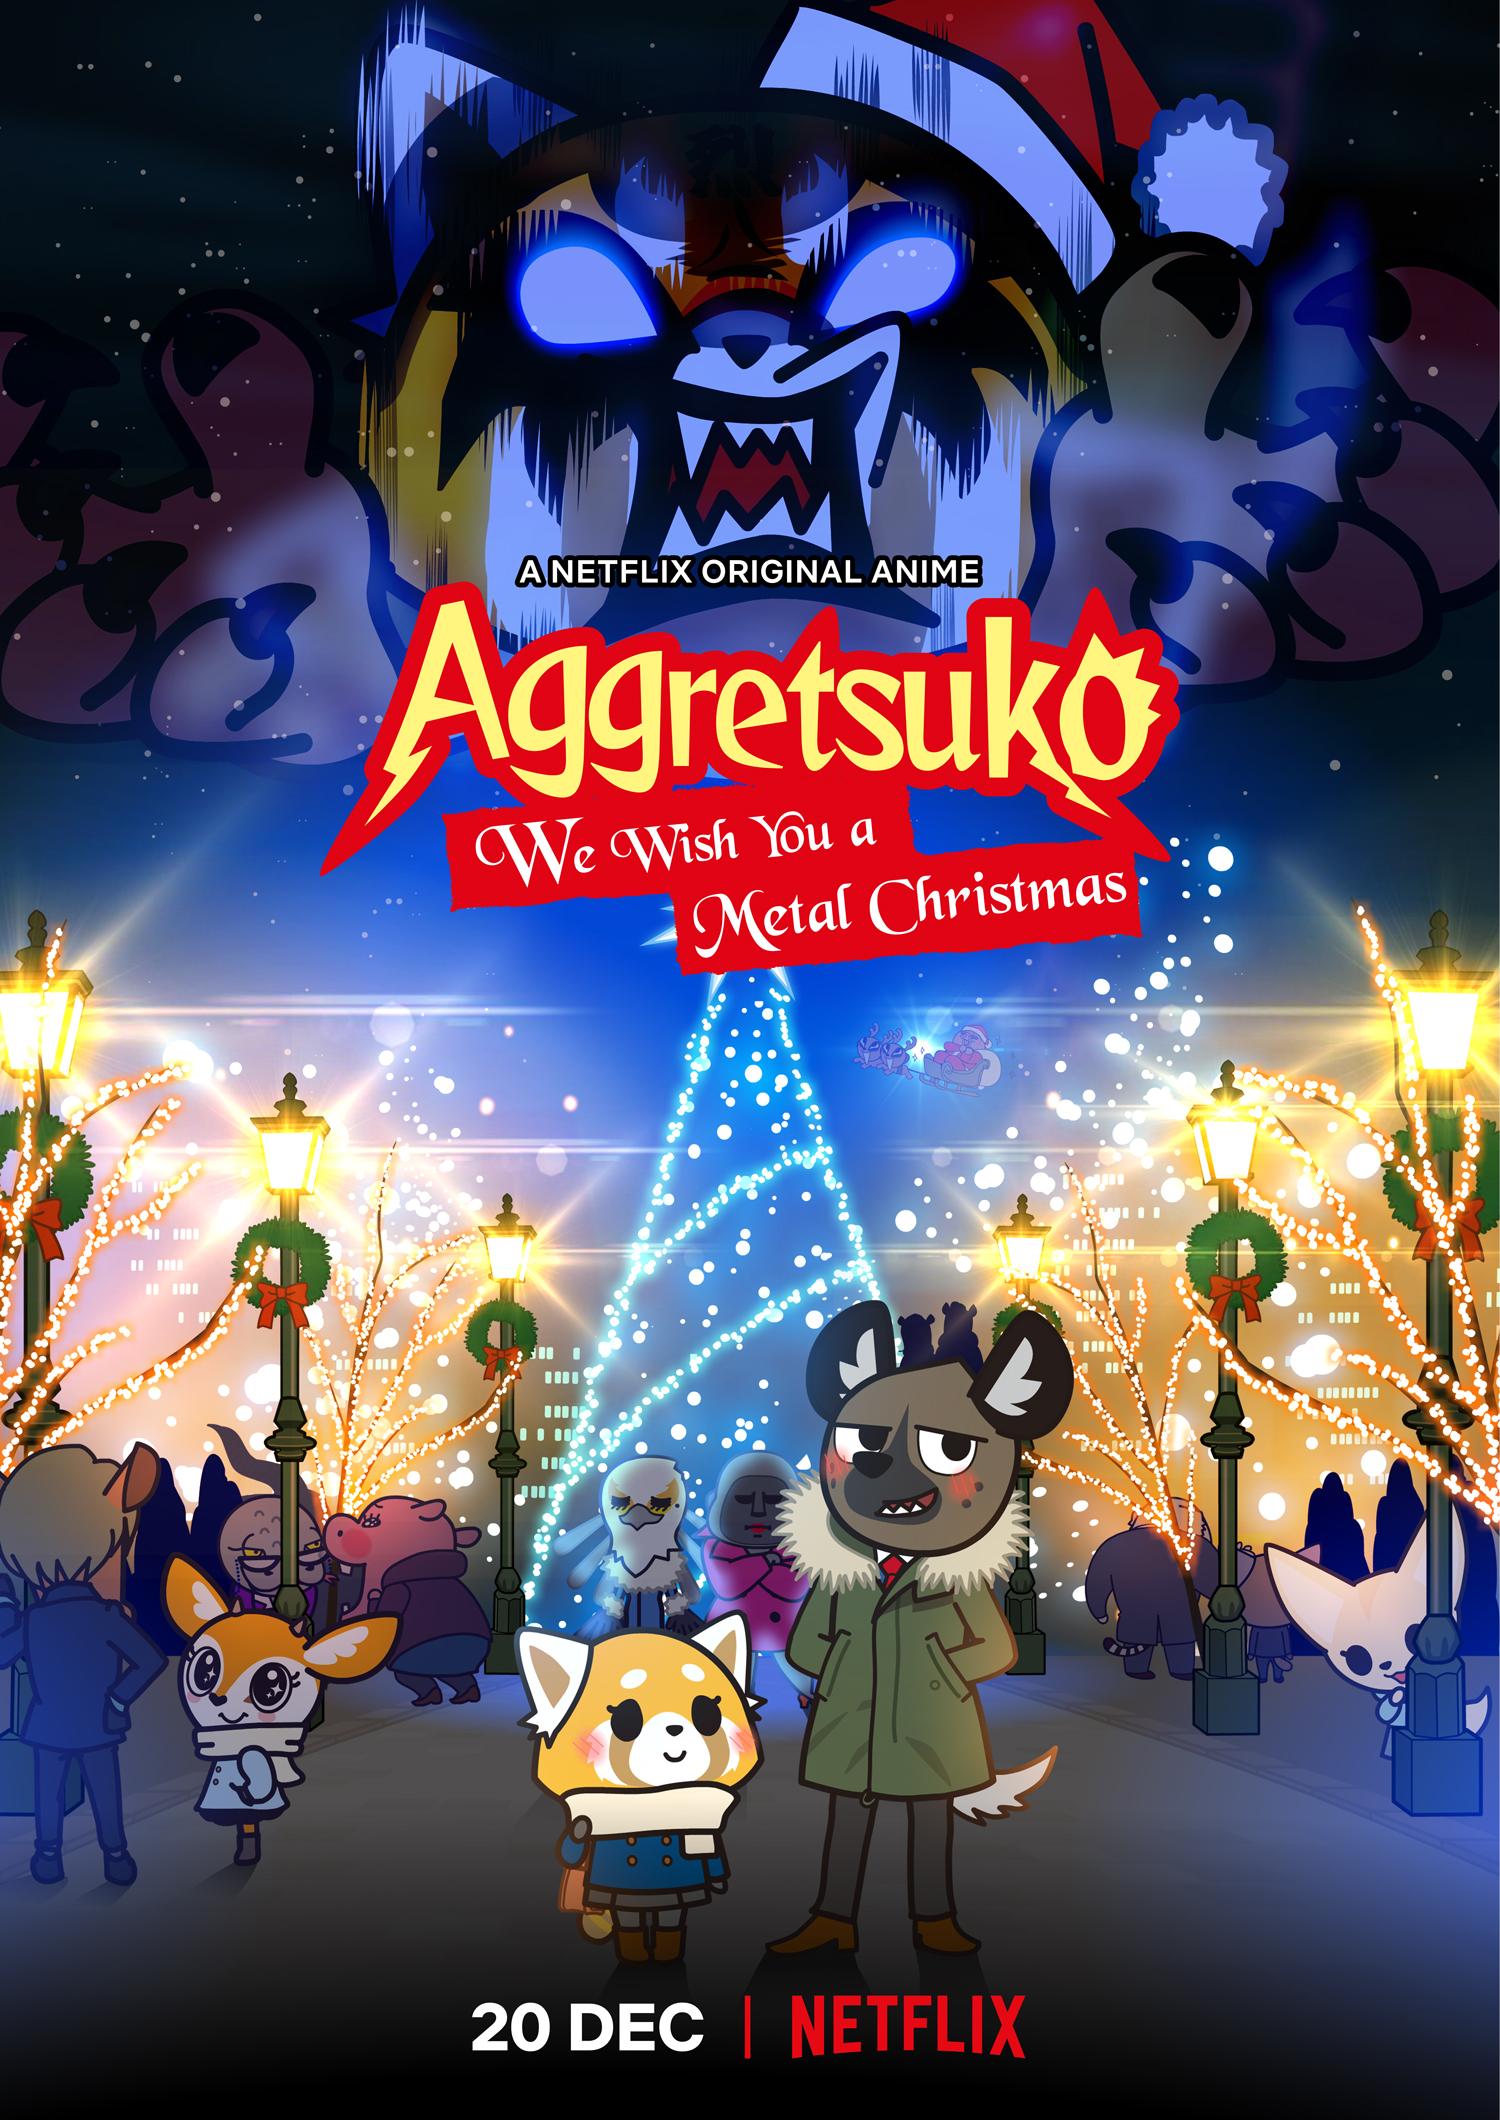 Aggretsuko Christmas.We Wish You A Metal Christmas Aggretsuko Wiki Fandom